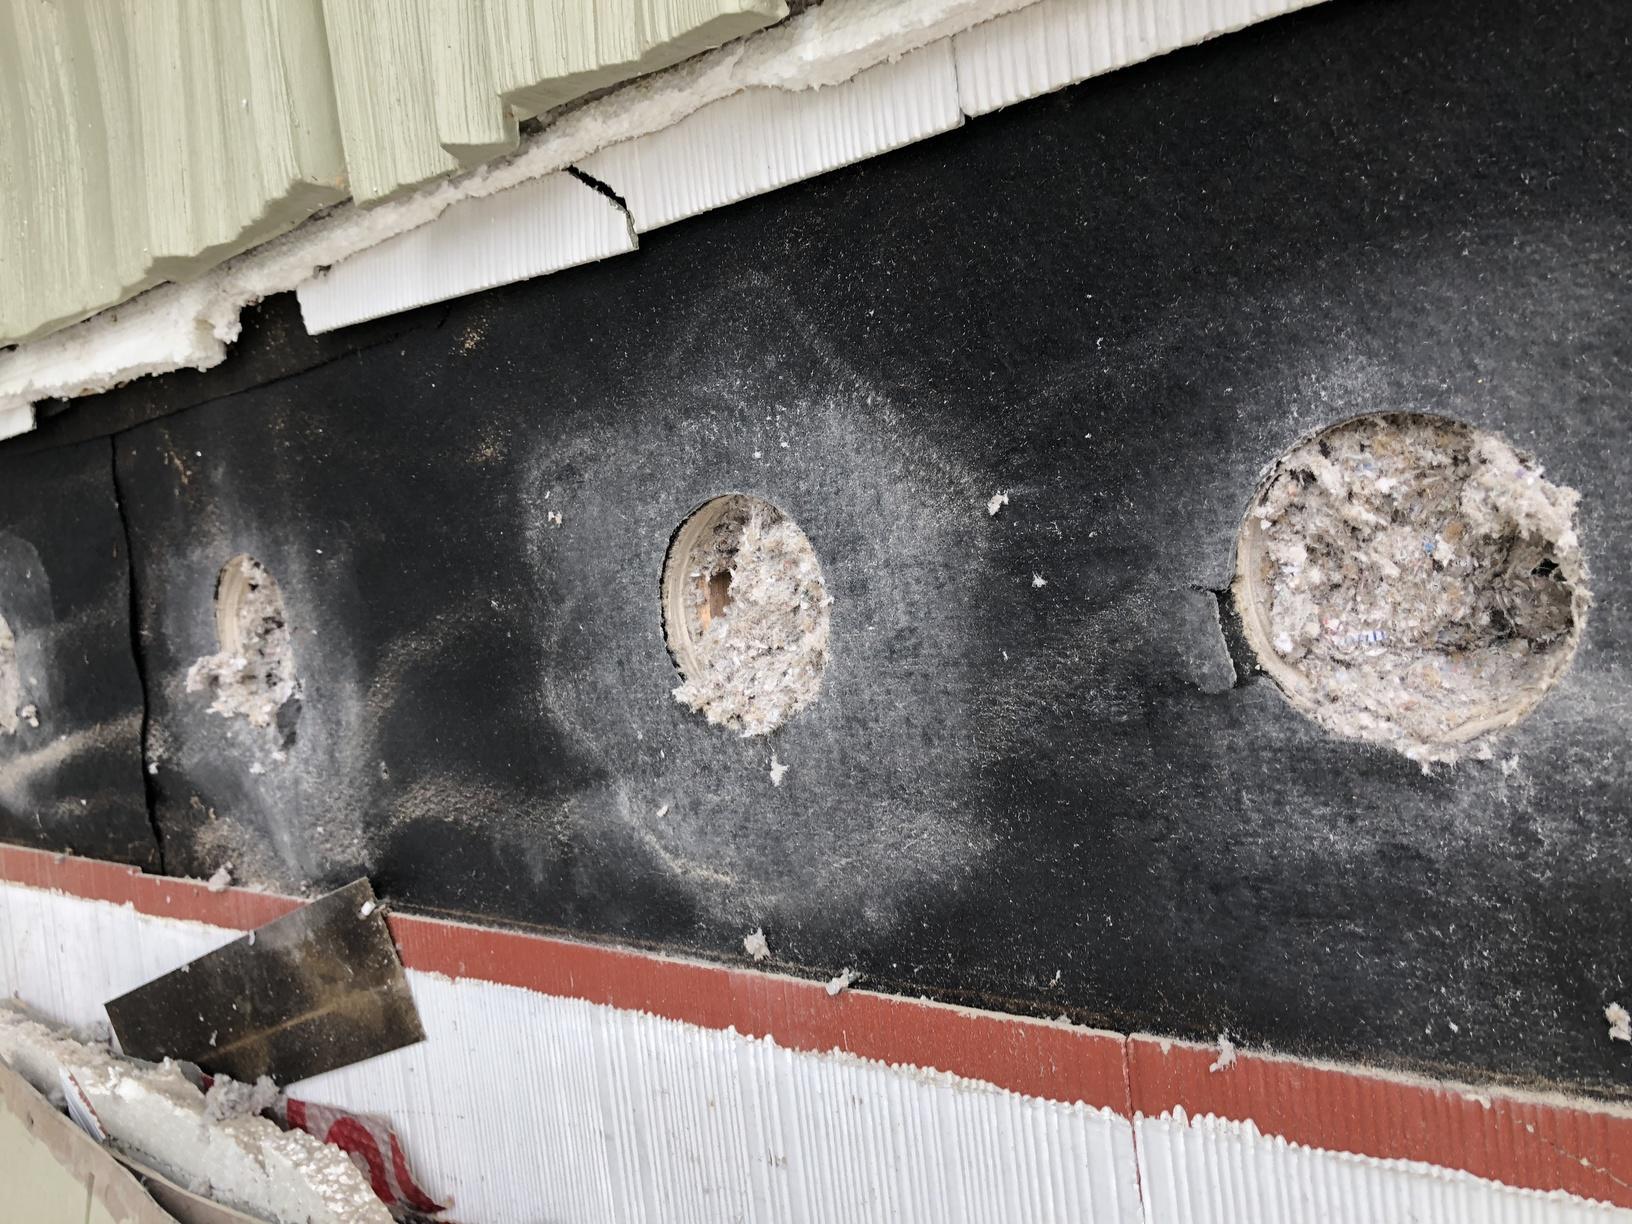 Dense Packing Exterior Walls - Selden, NY - After Photo